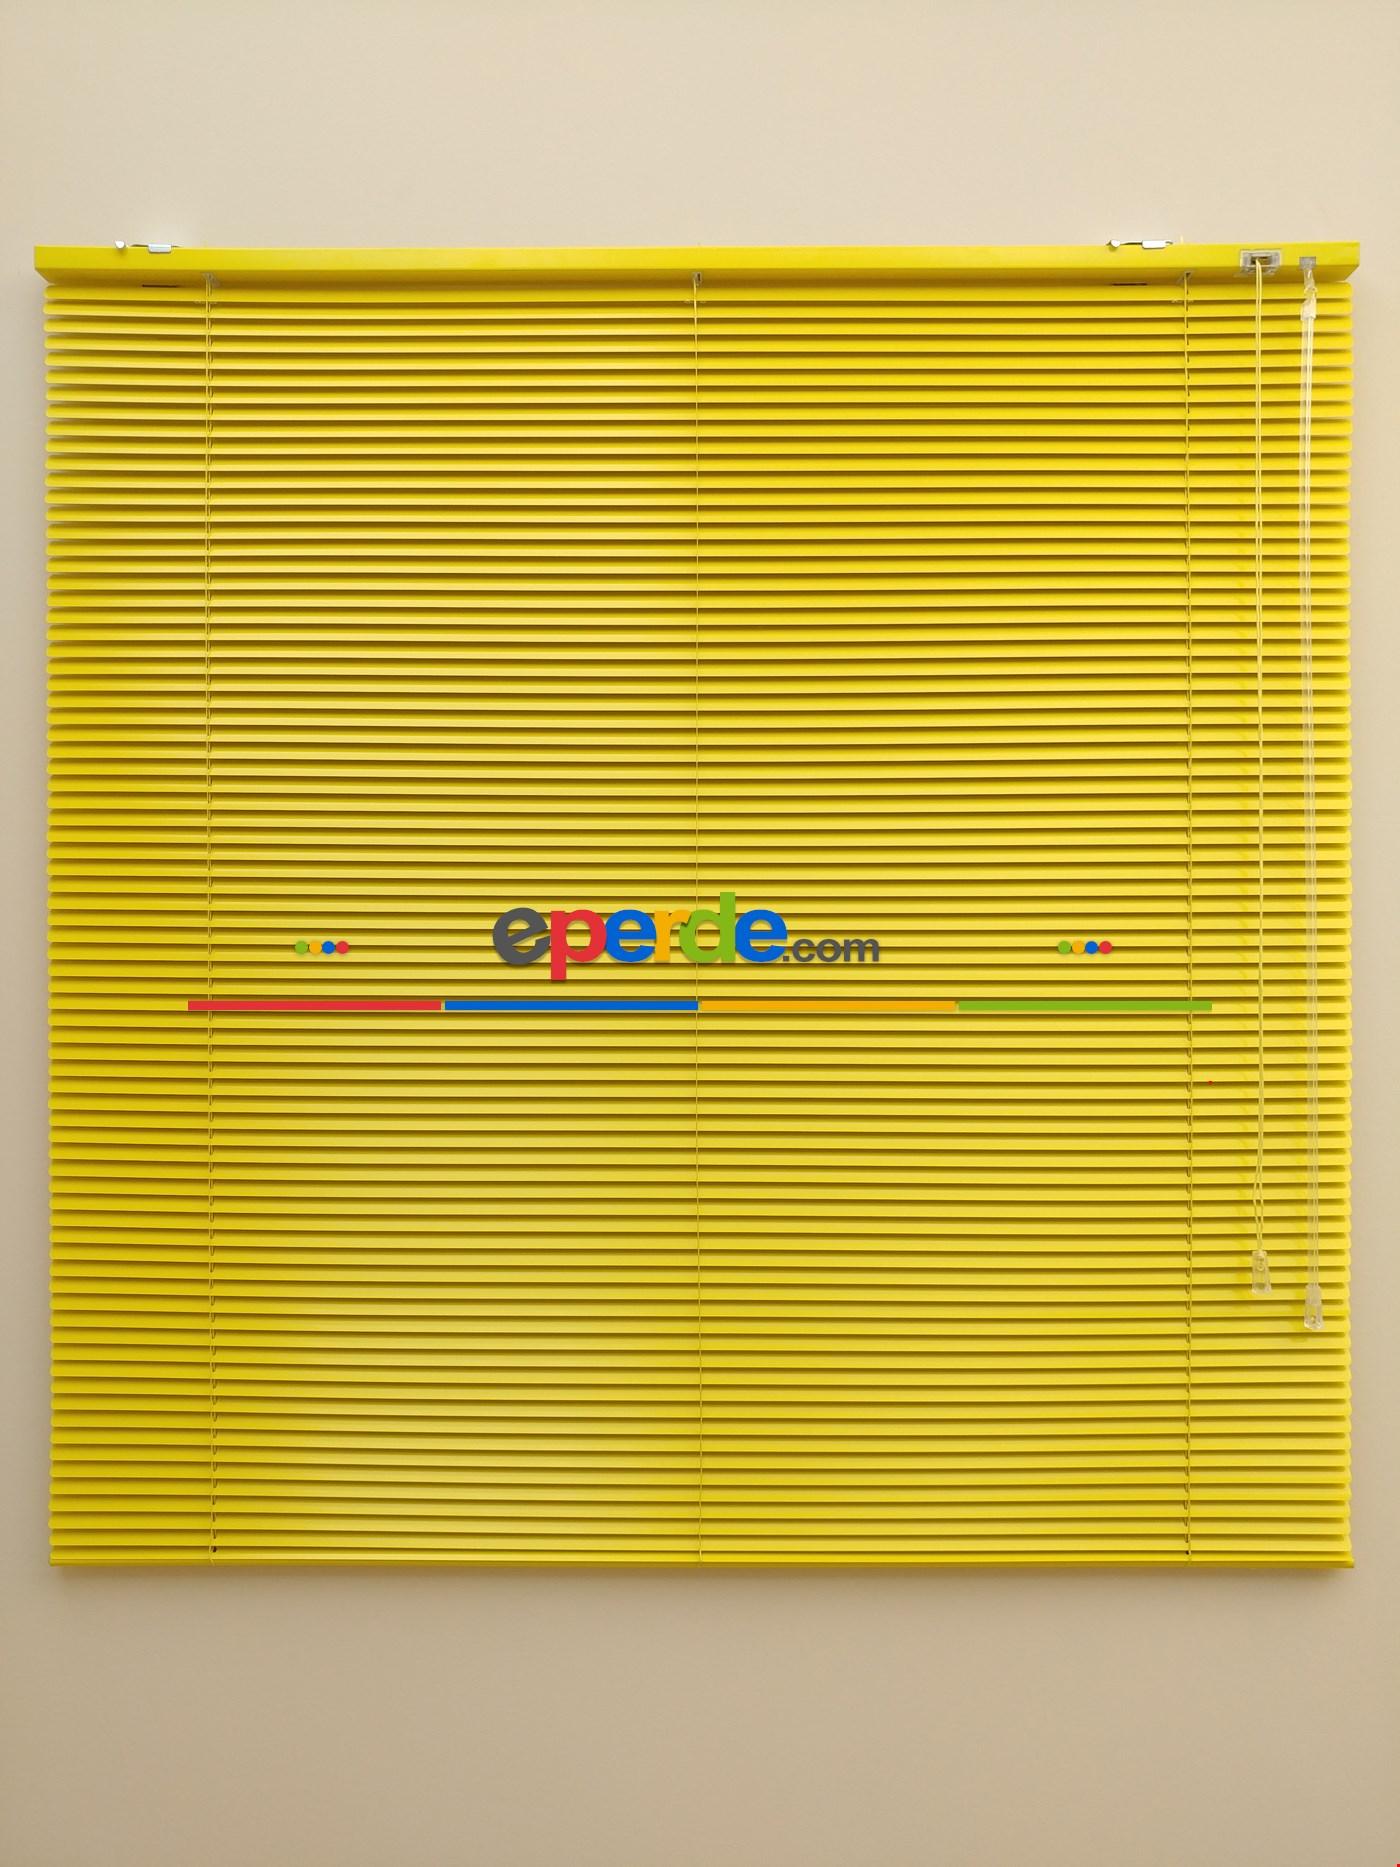 Sarı - Alüminyum Jaluzi Perde - 16mm